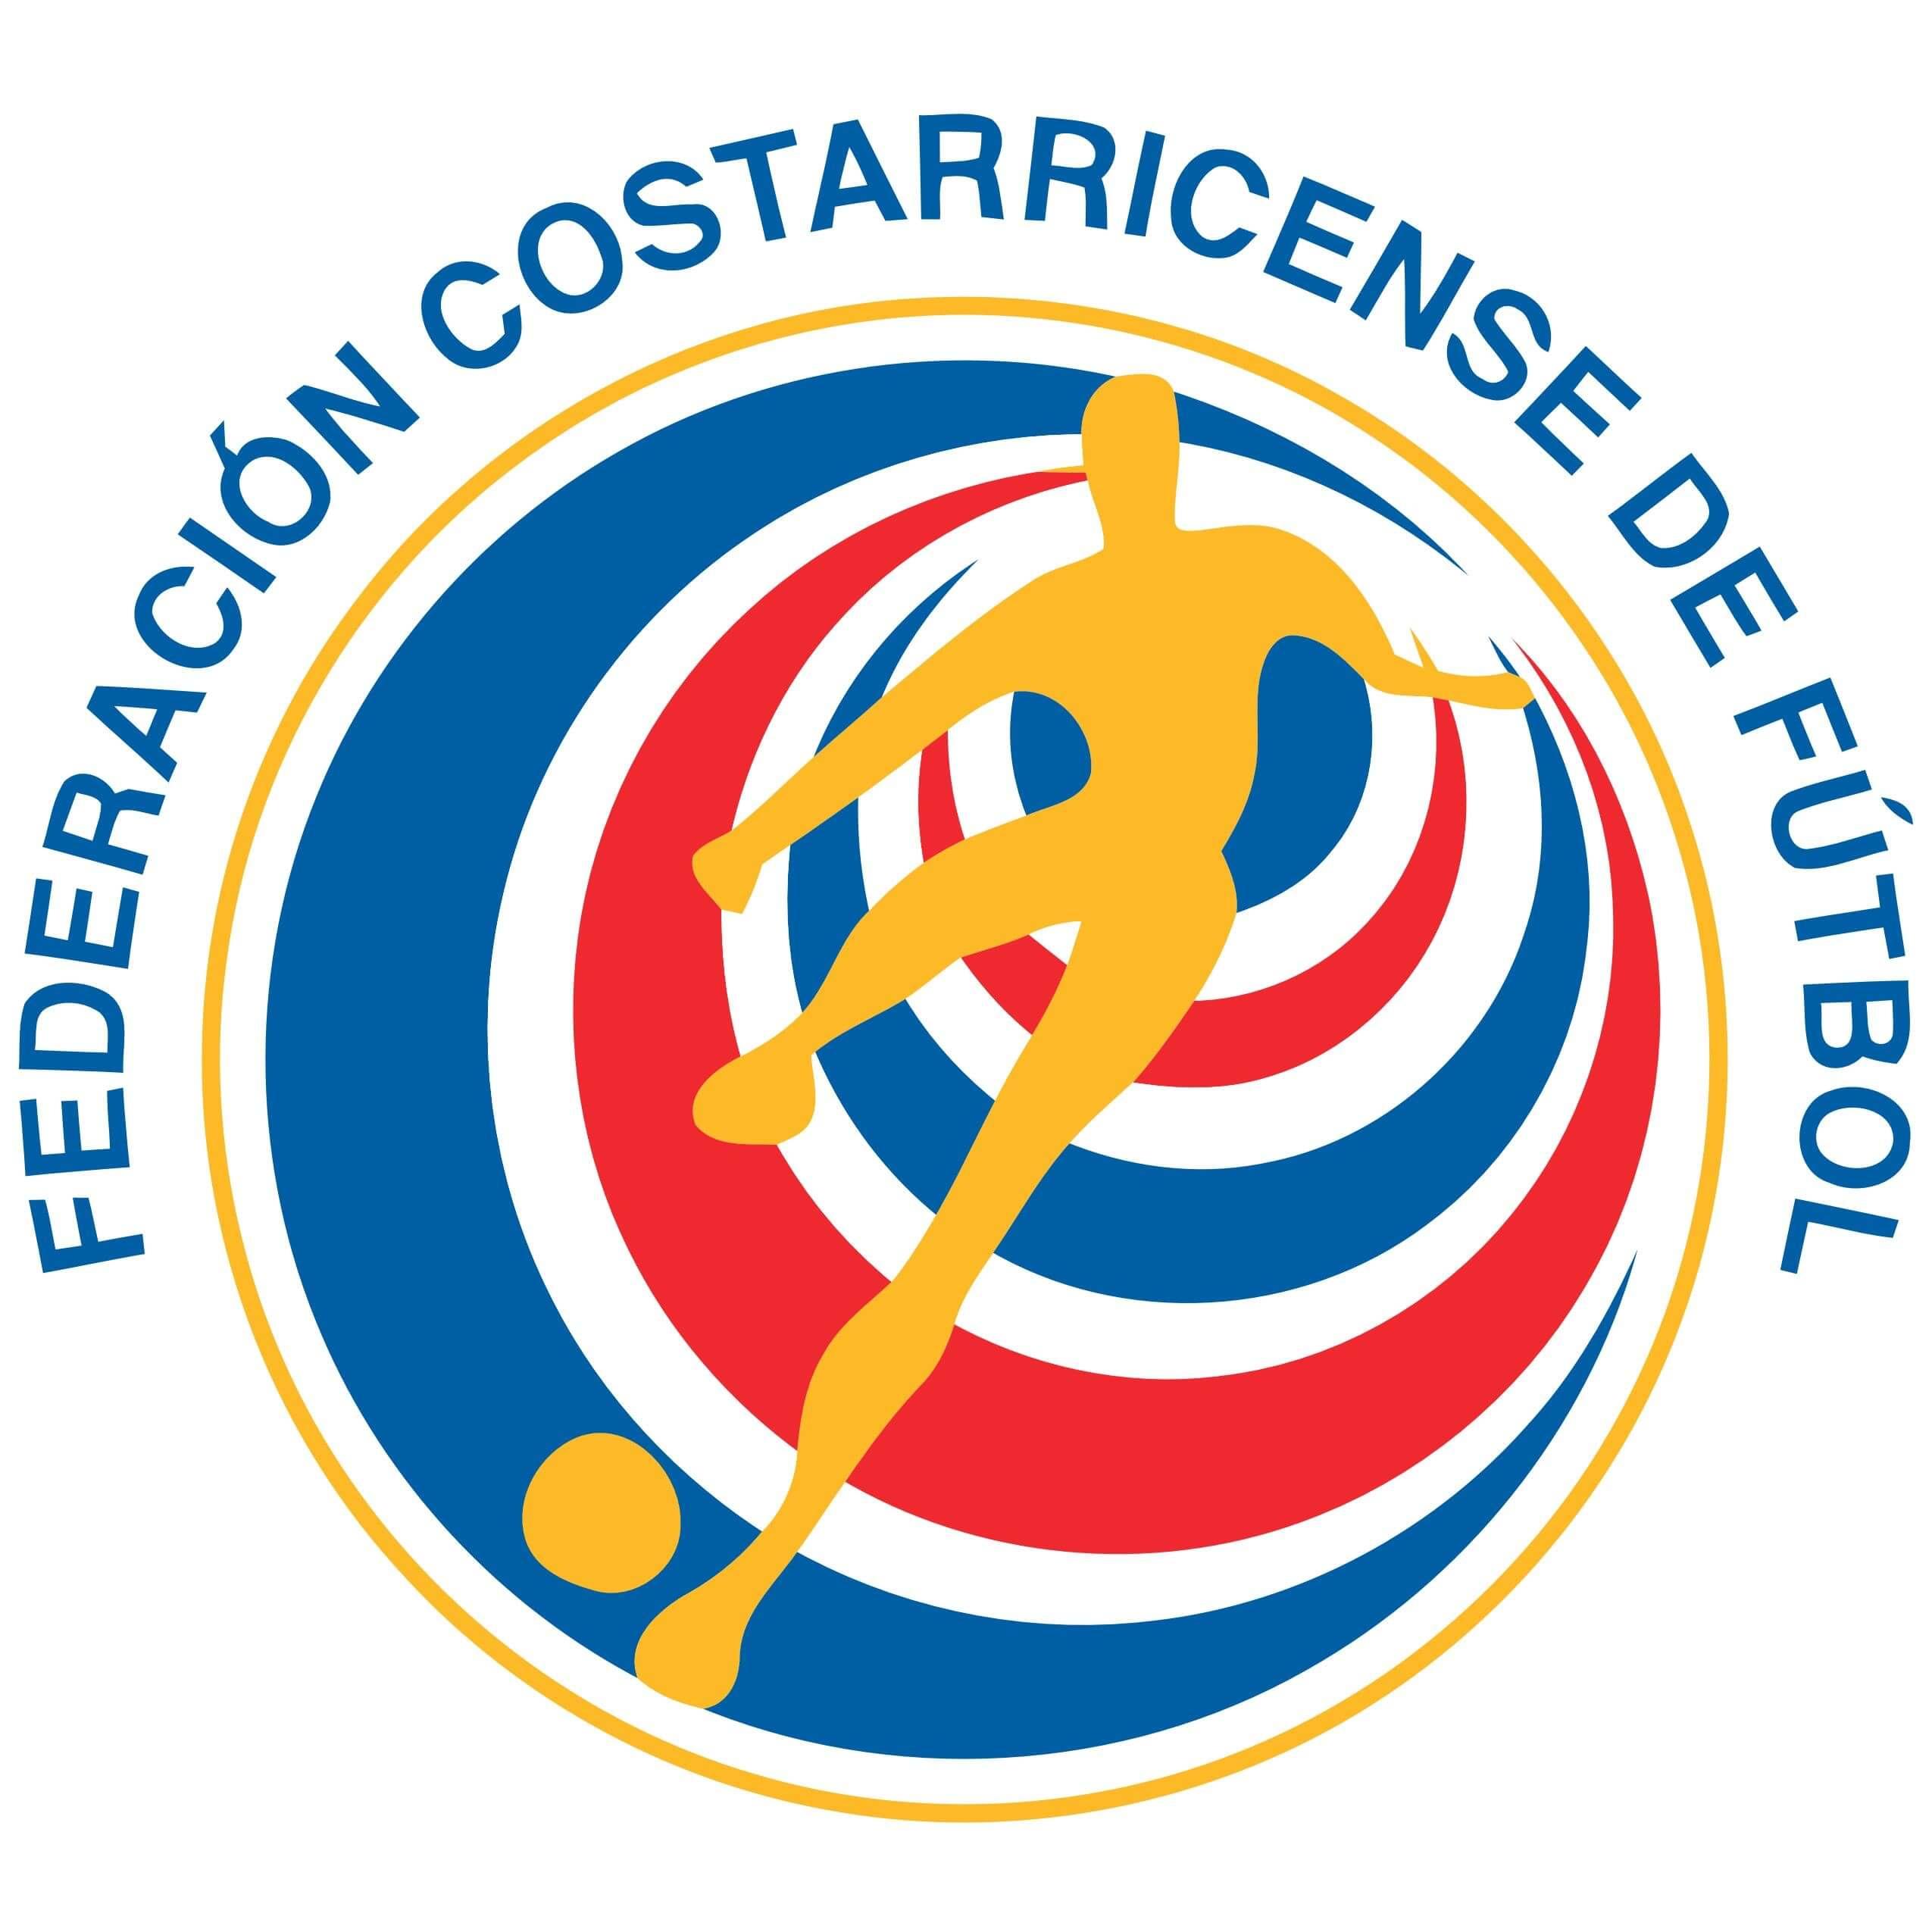 costa-rican-football-federation-costa-rica-national-football-team-logo